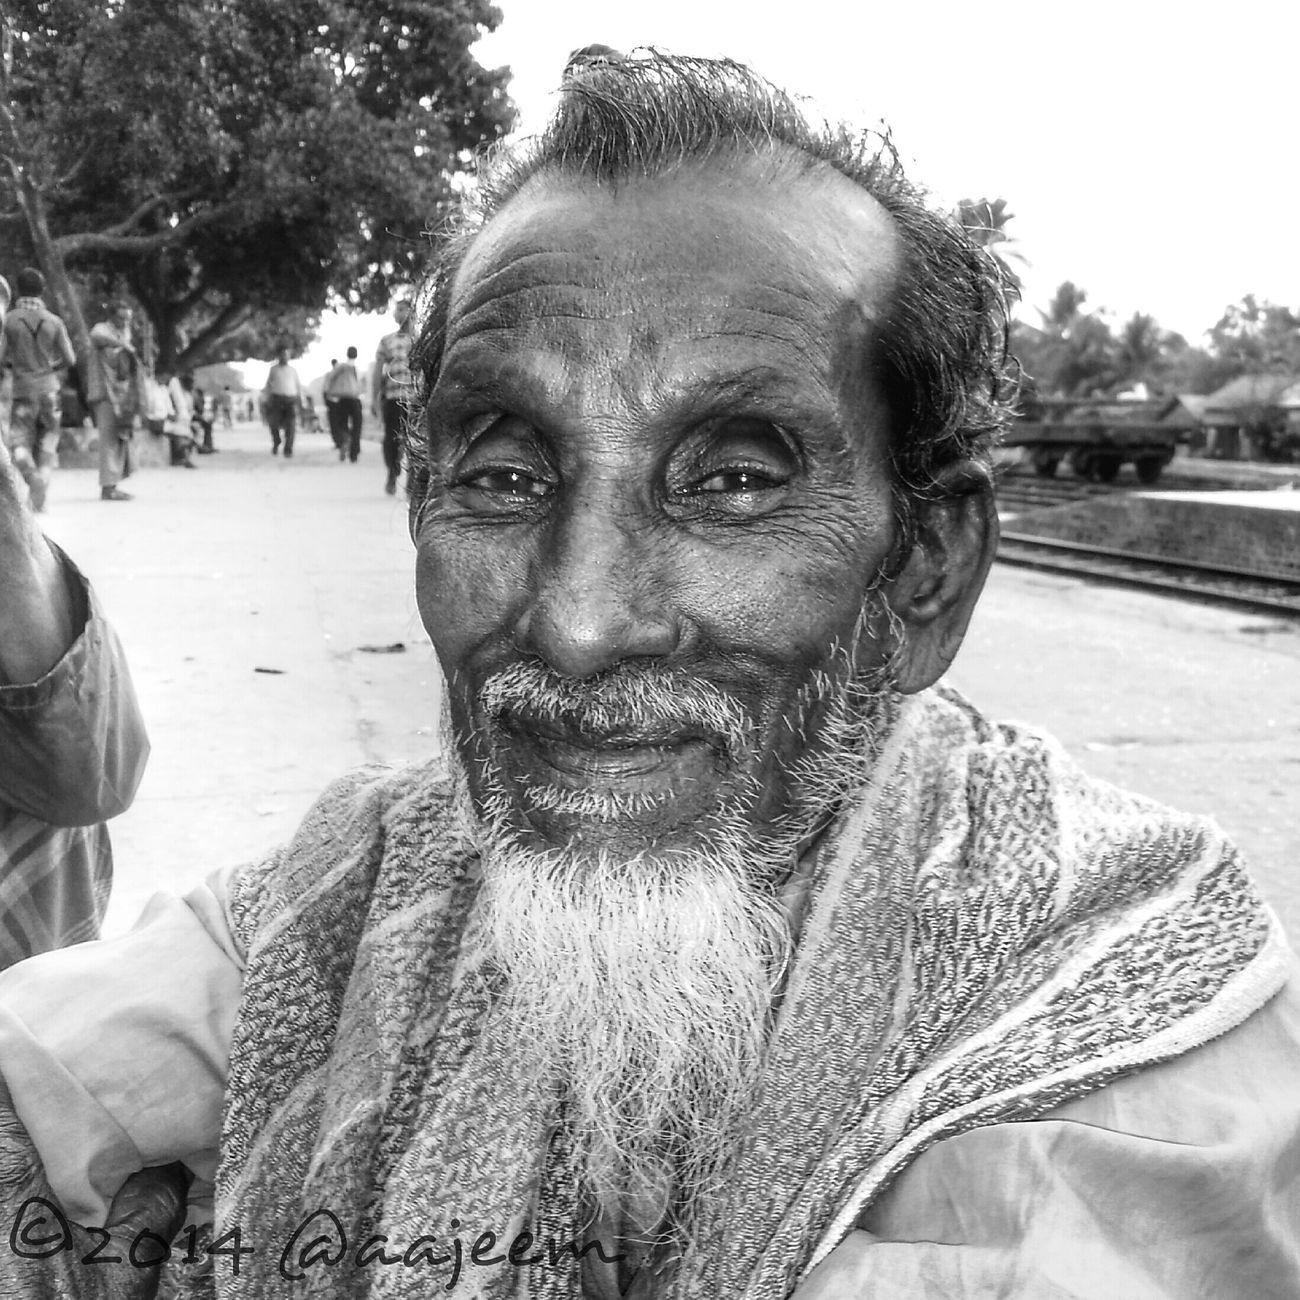 Portrait Black And White Bangladesh Oldman Jessore Streetphotography Street Photography Streetlife